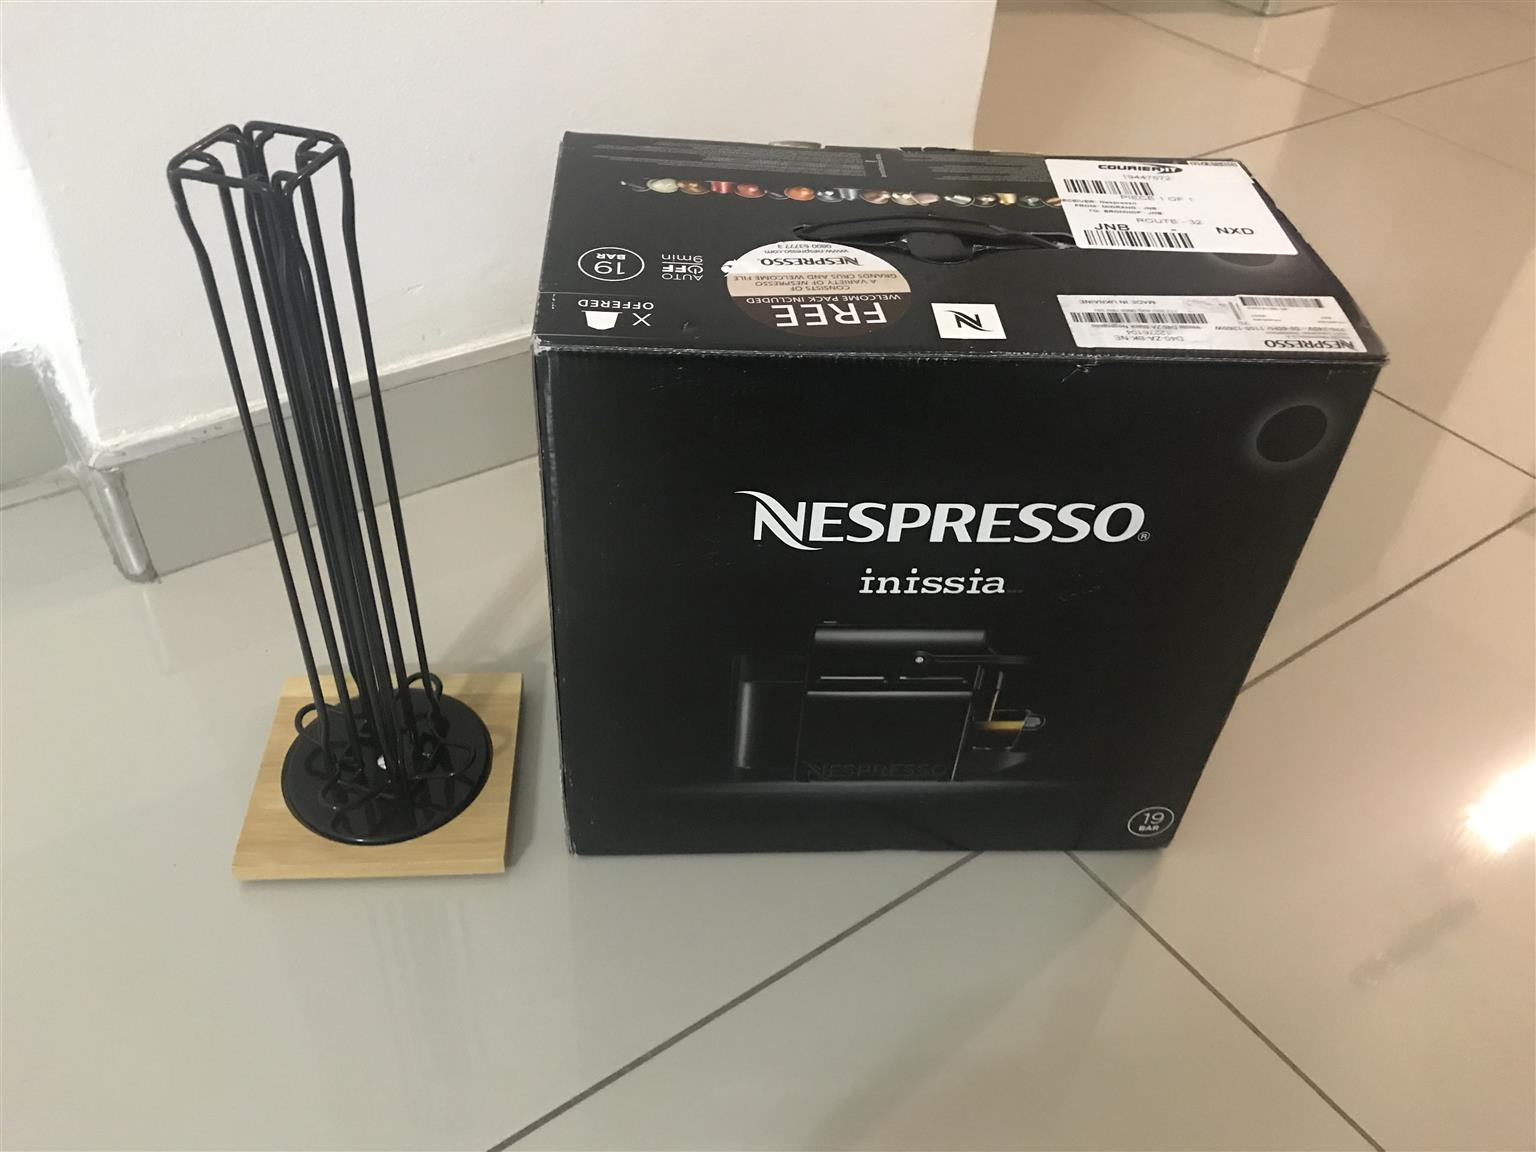 Nespresso Inissia Machine